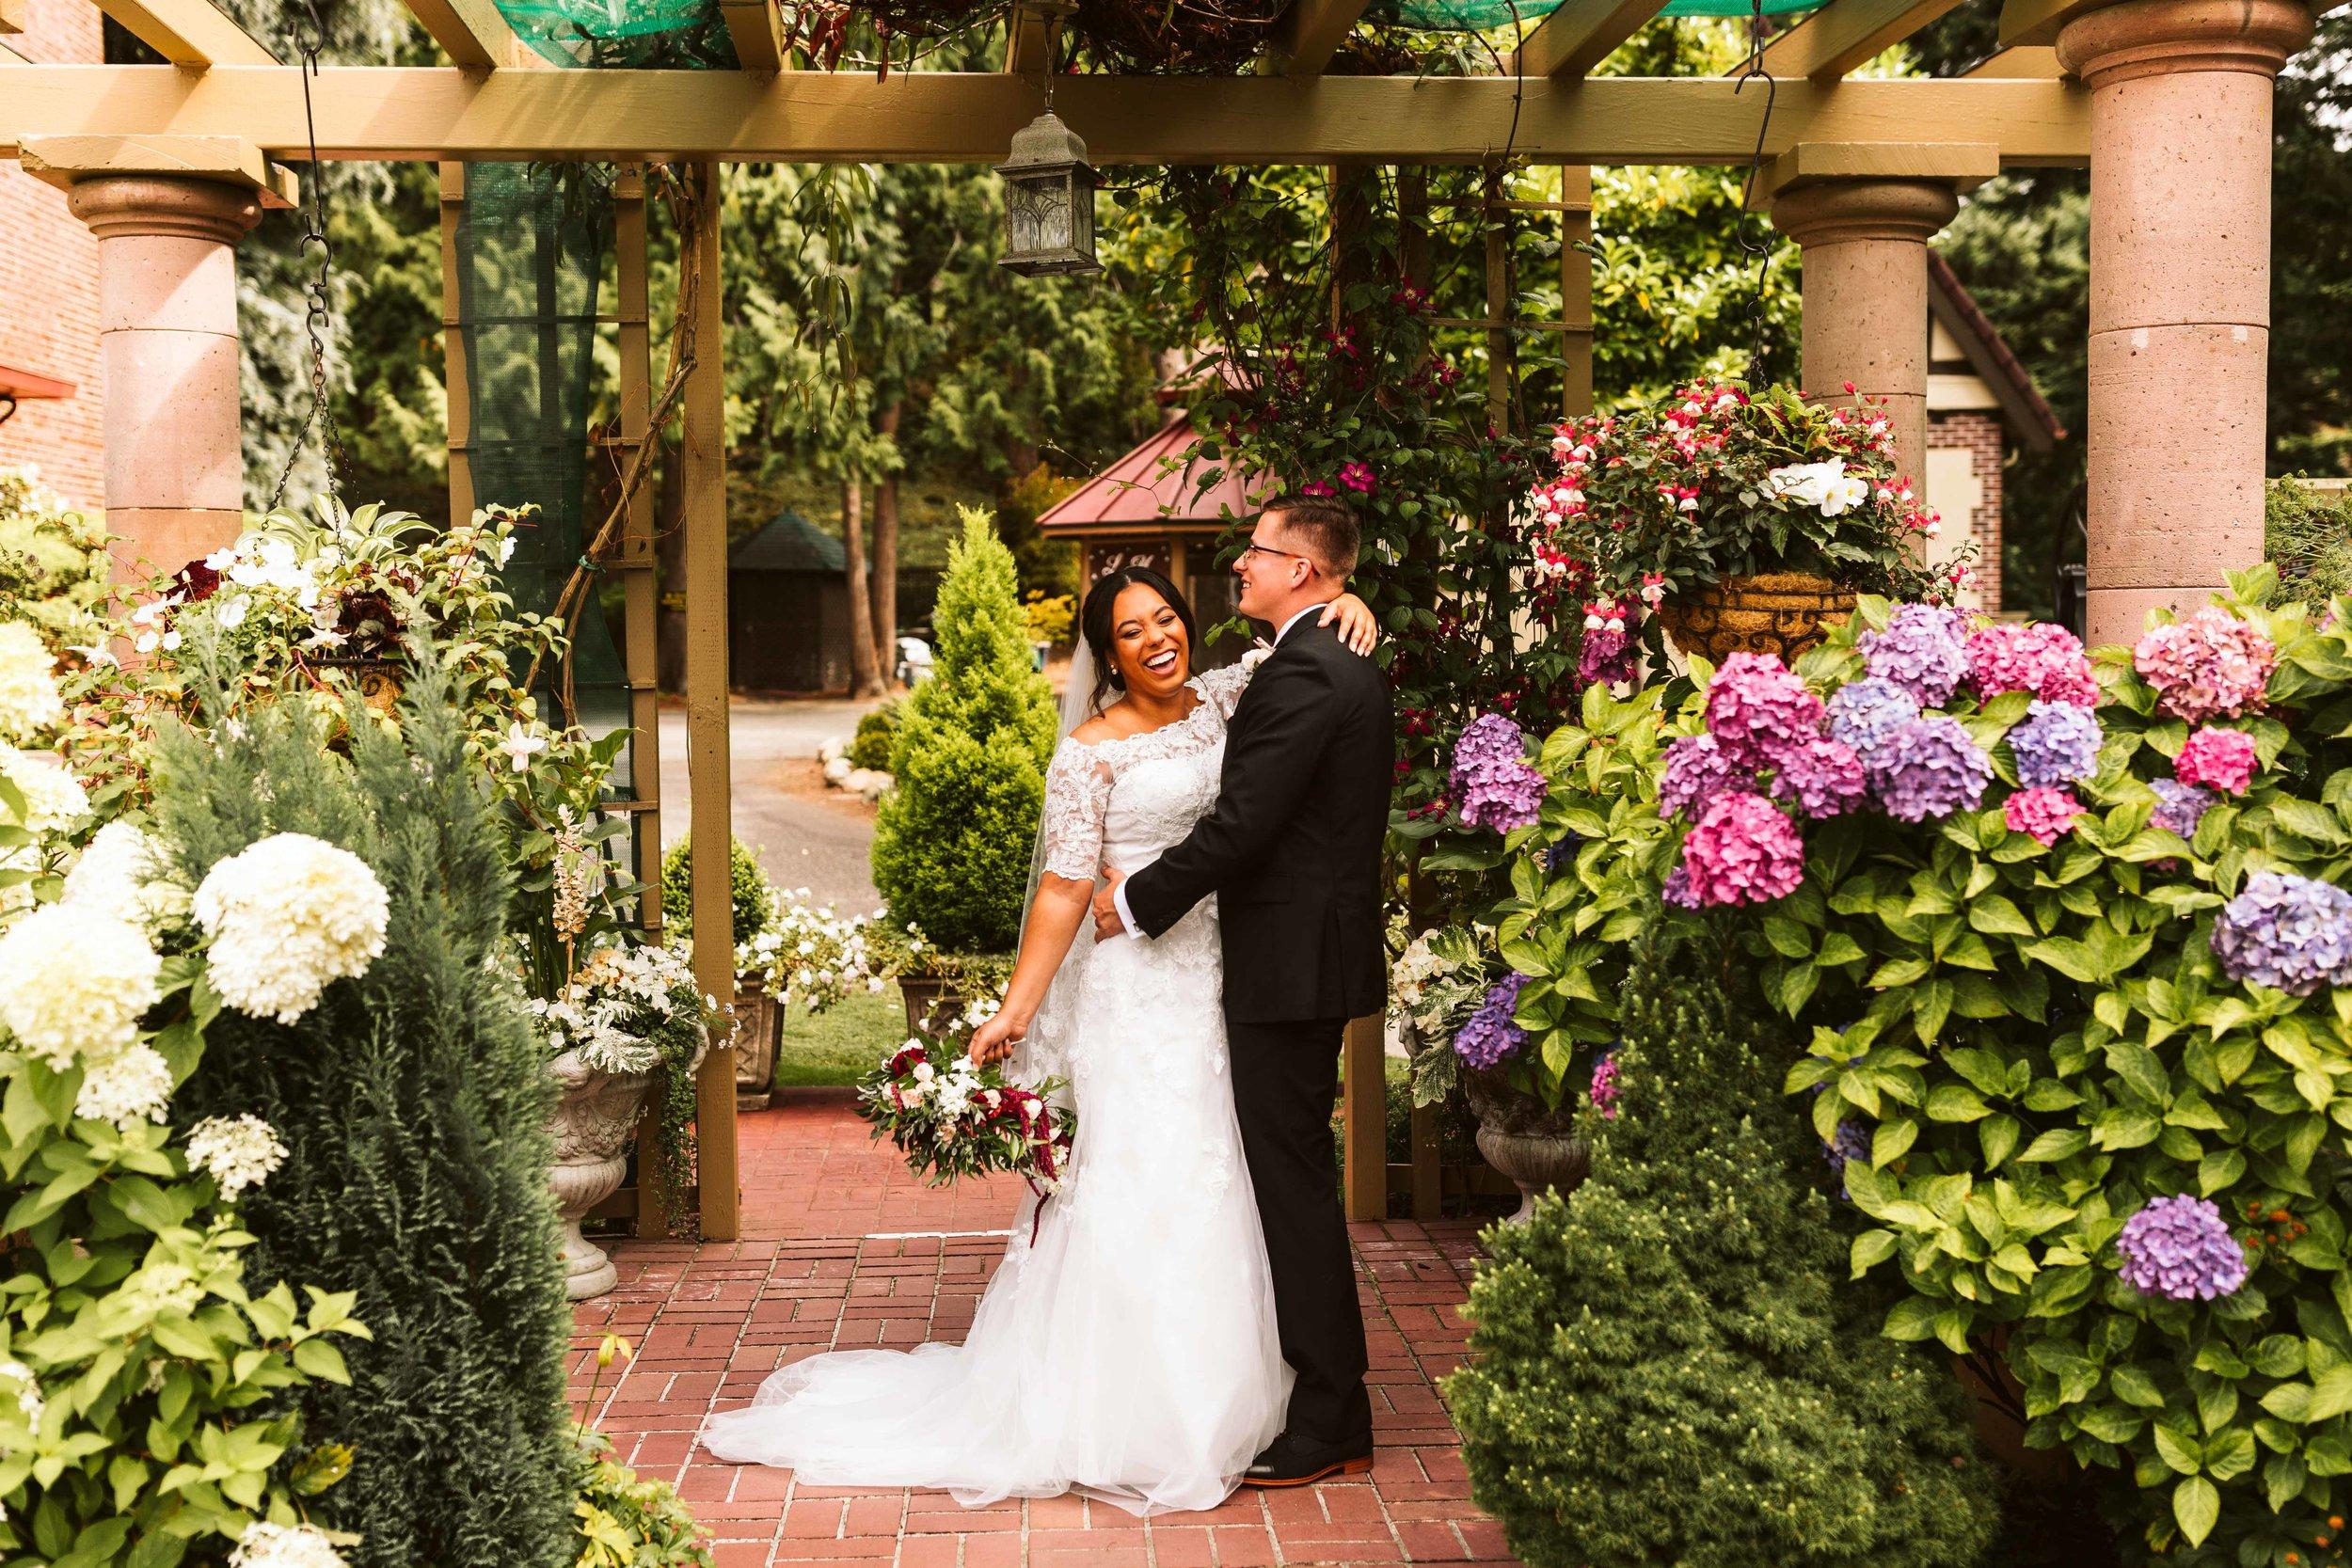 lairmont-manor-wedding-29.jpg